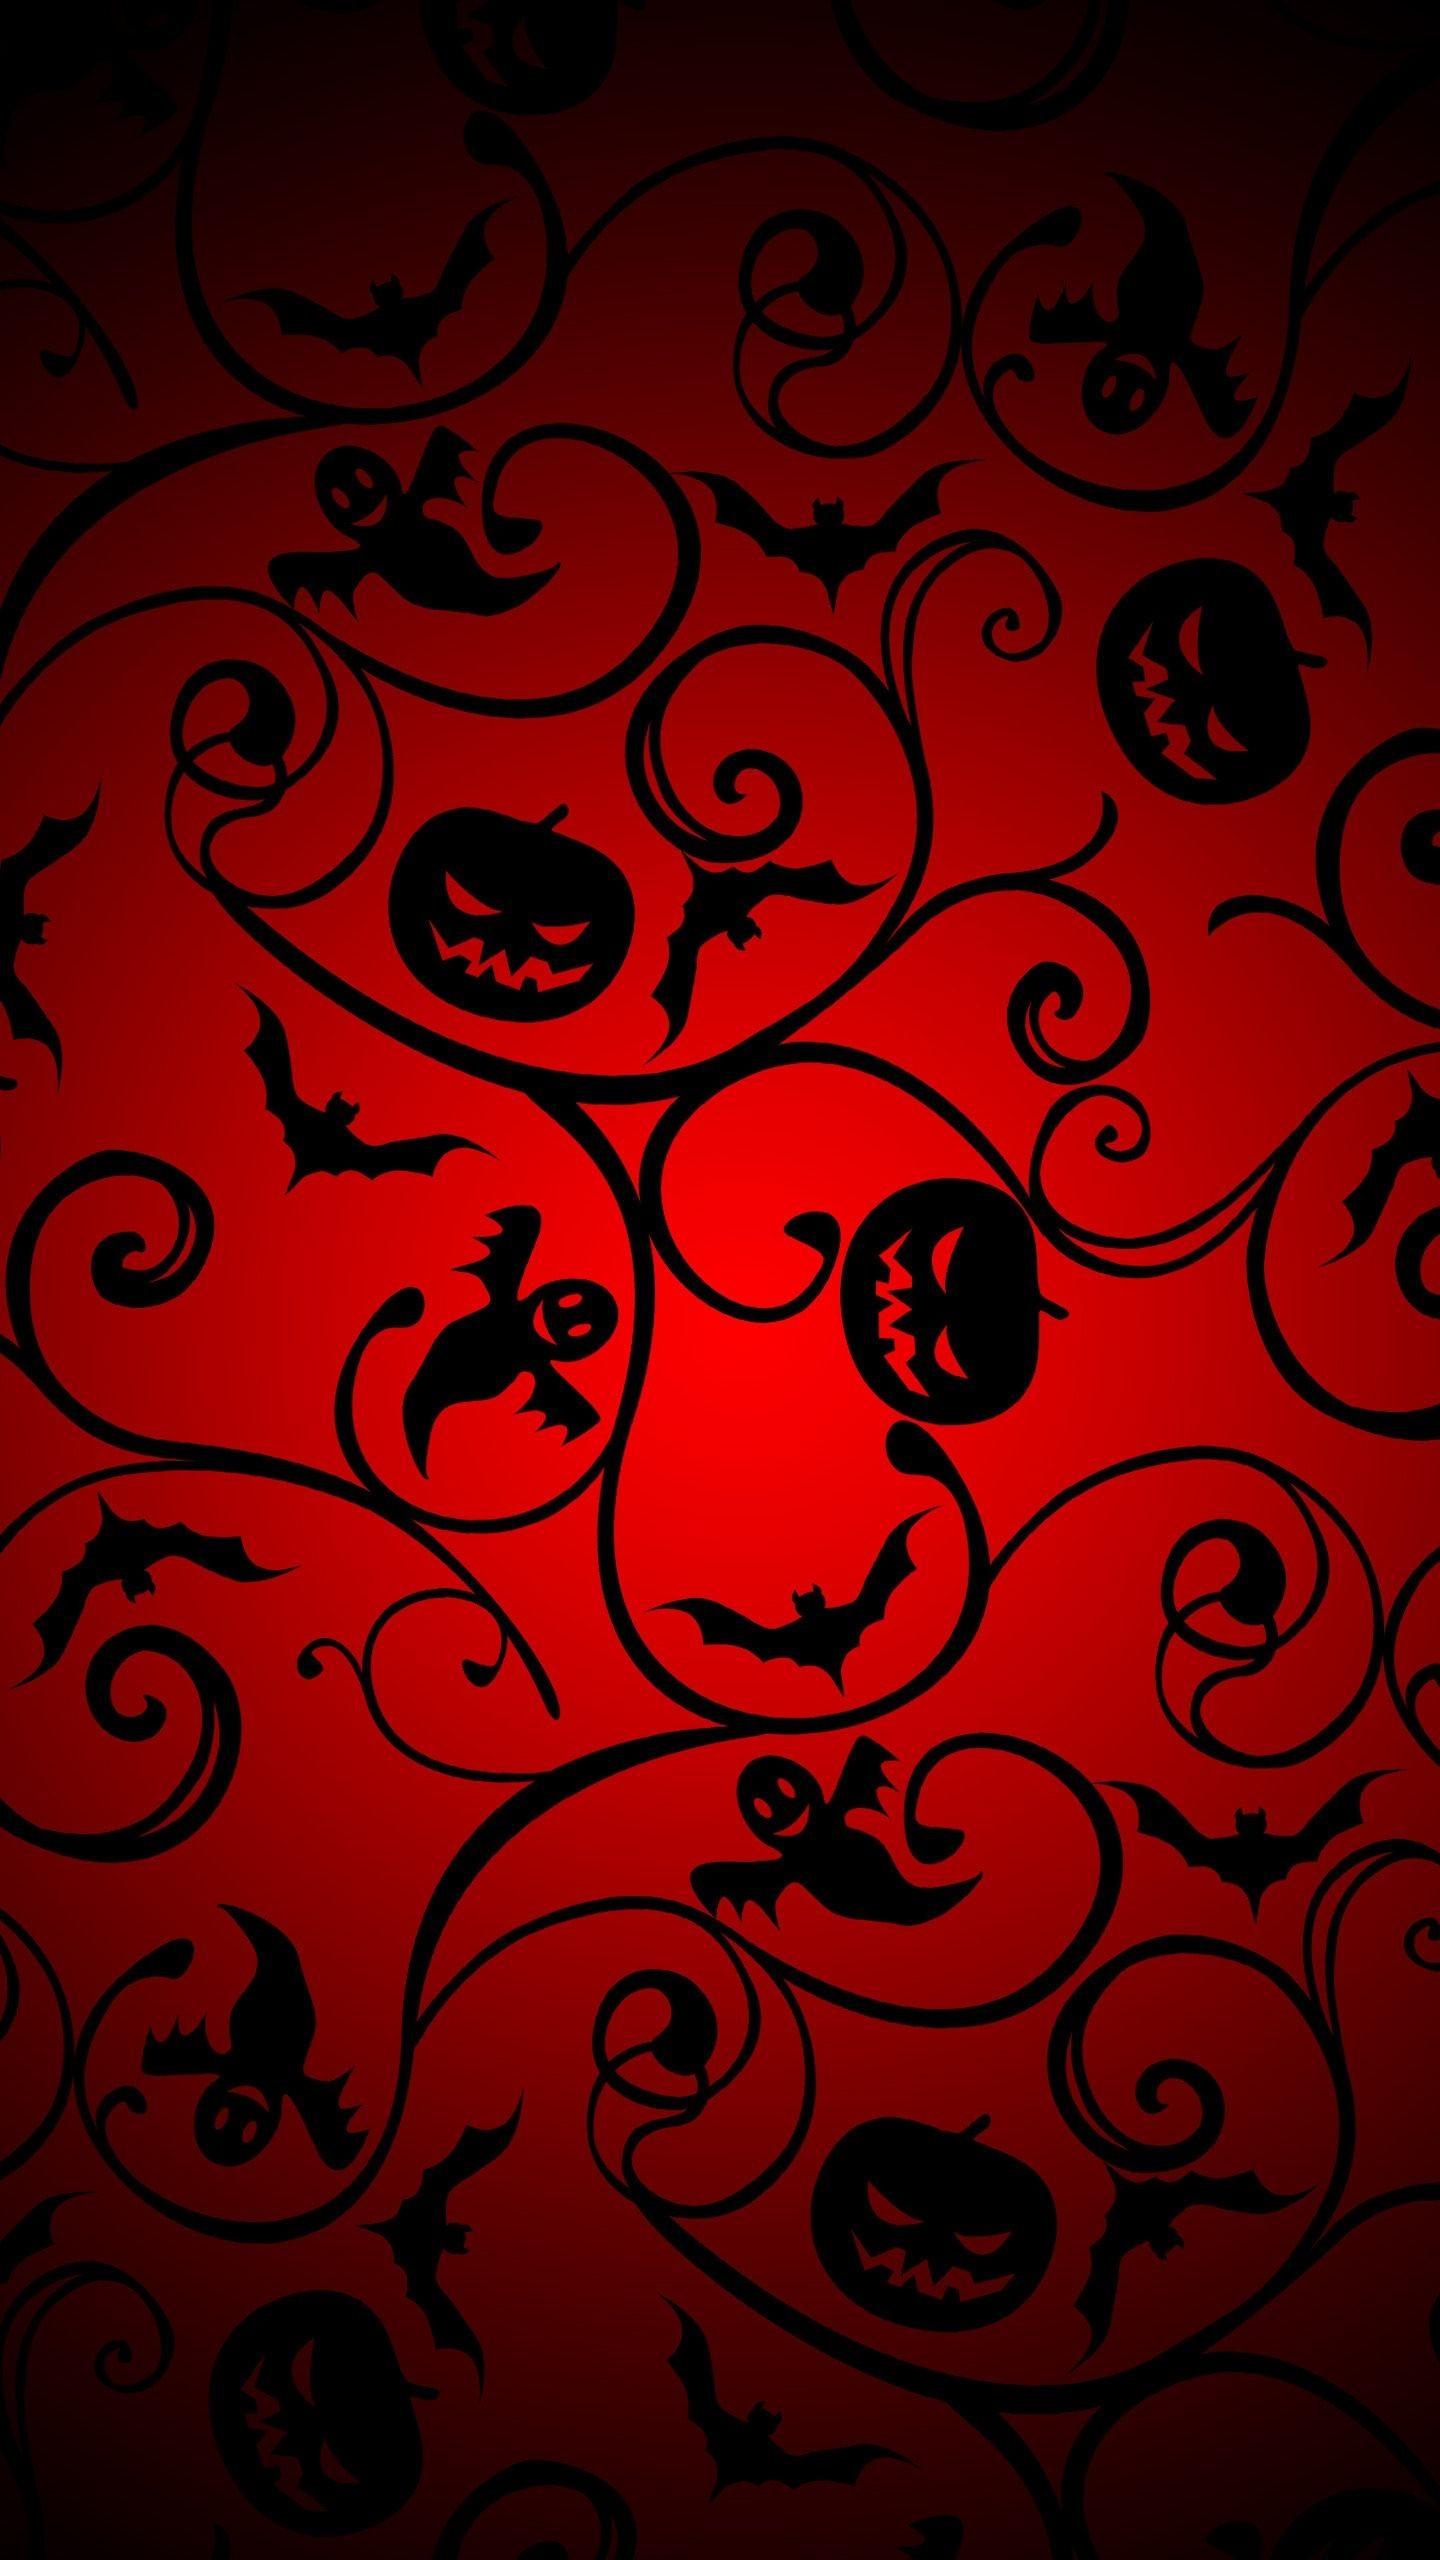 halloween pattern 2 wallpaper background